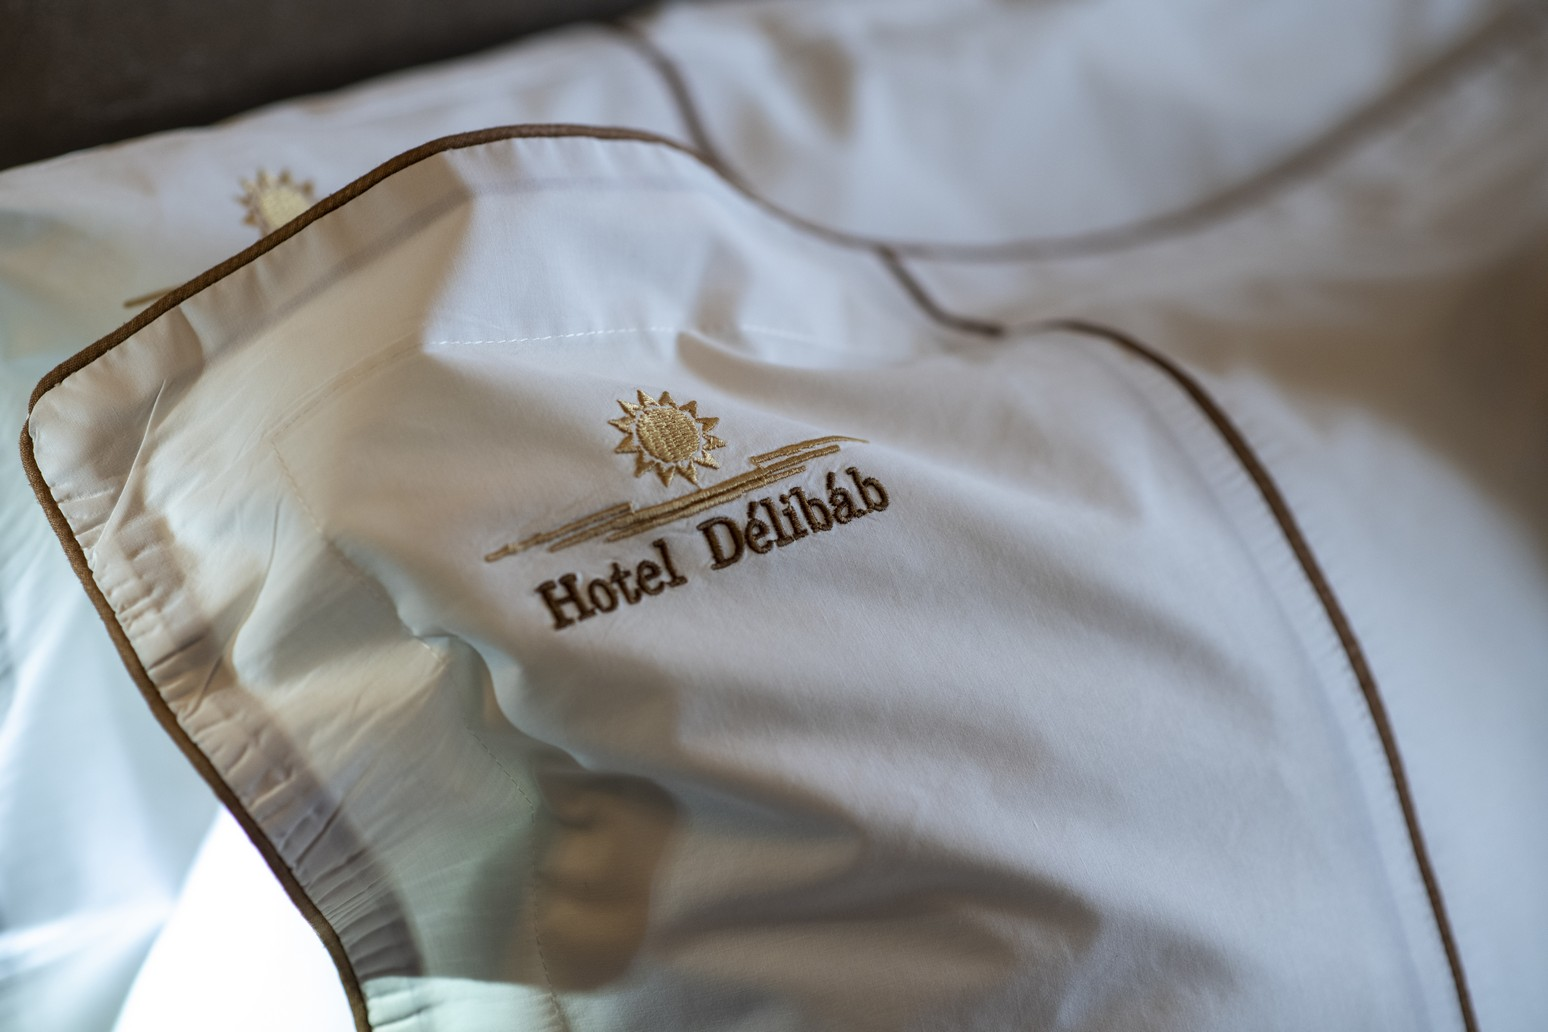 Classic-franciaagy-parna-HotelDelibab